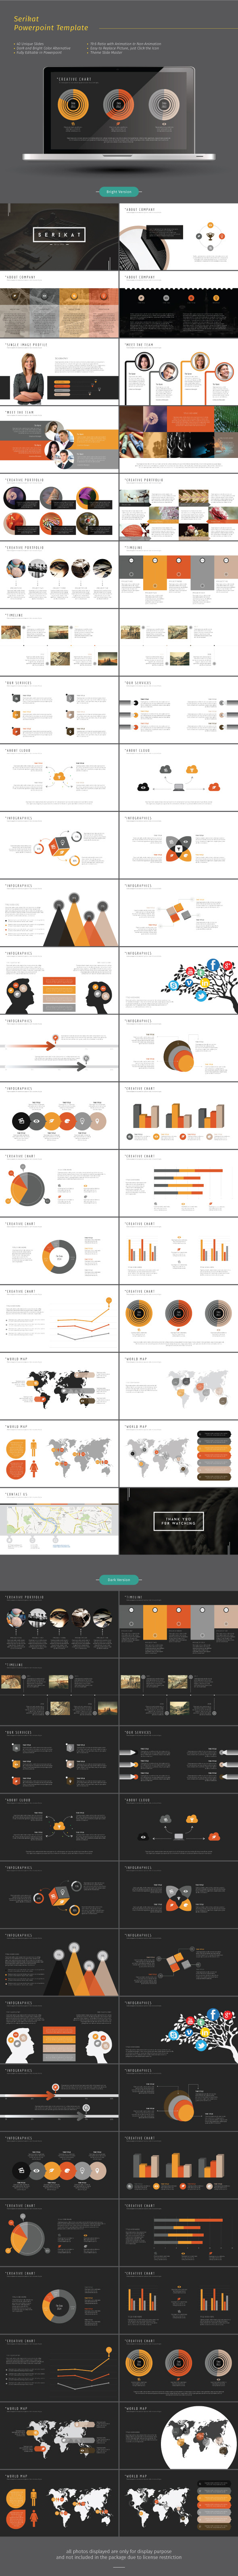 Serikat Powerpoint Template - Business PowerPoint Templates